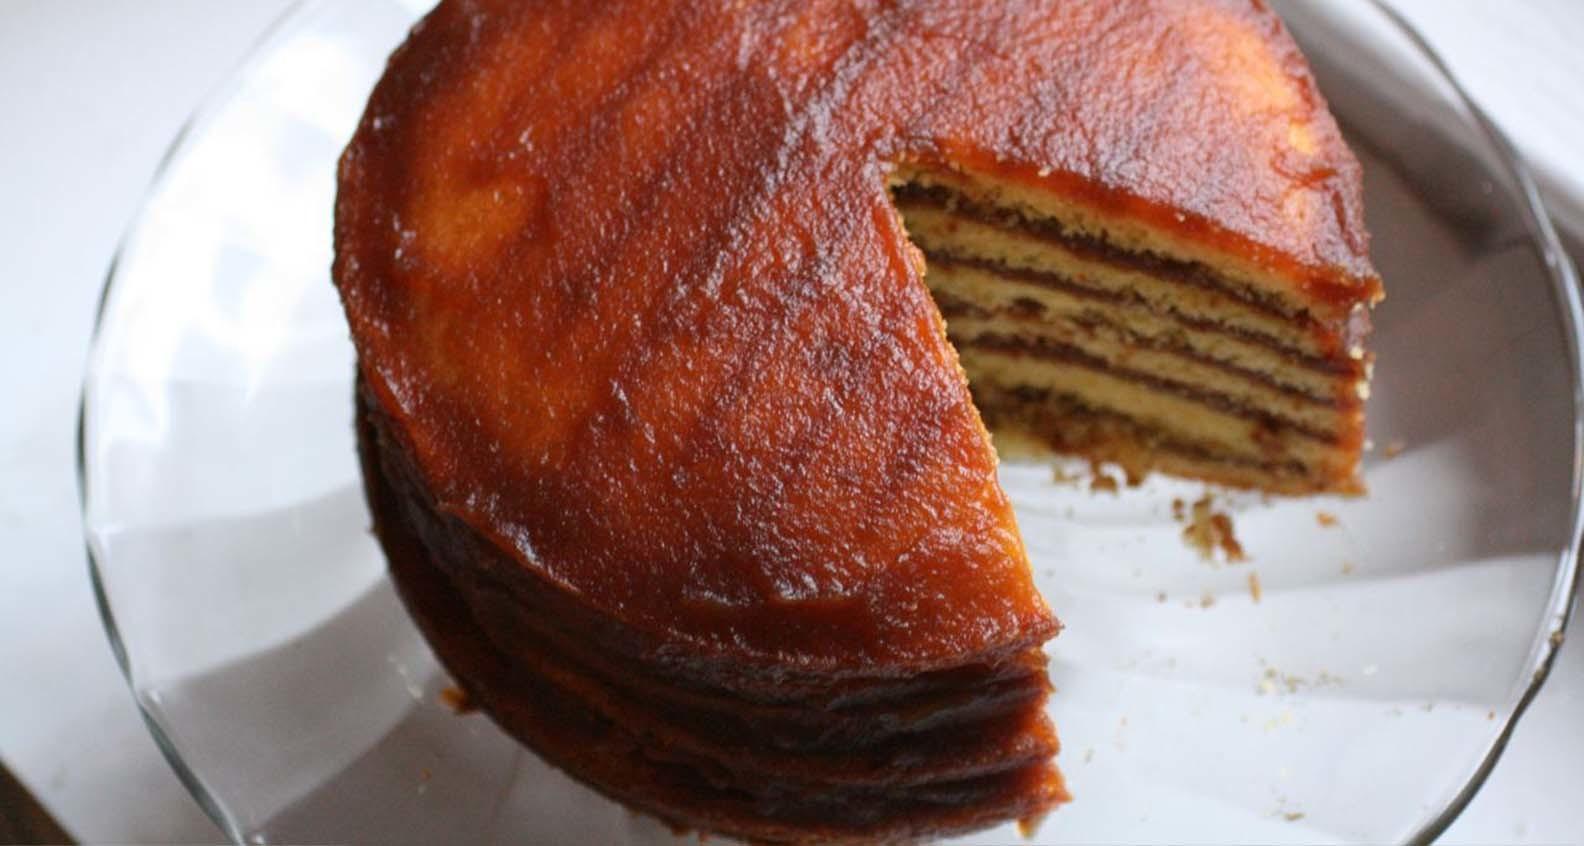 Ronni lundy apple stack cake credit thebittenworddotcom 2